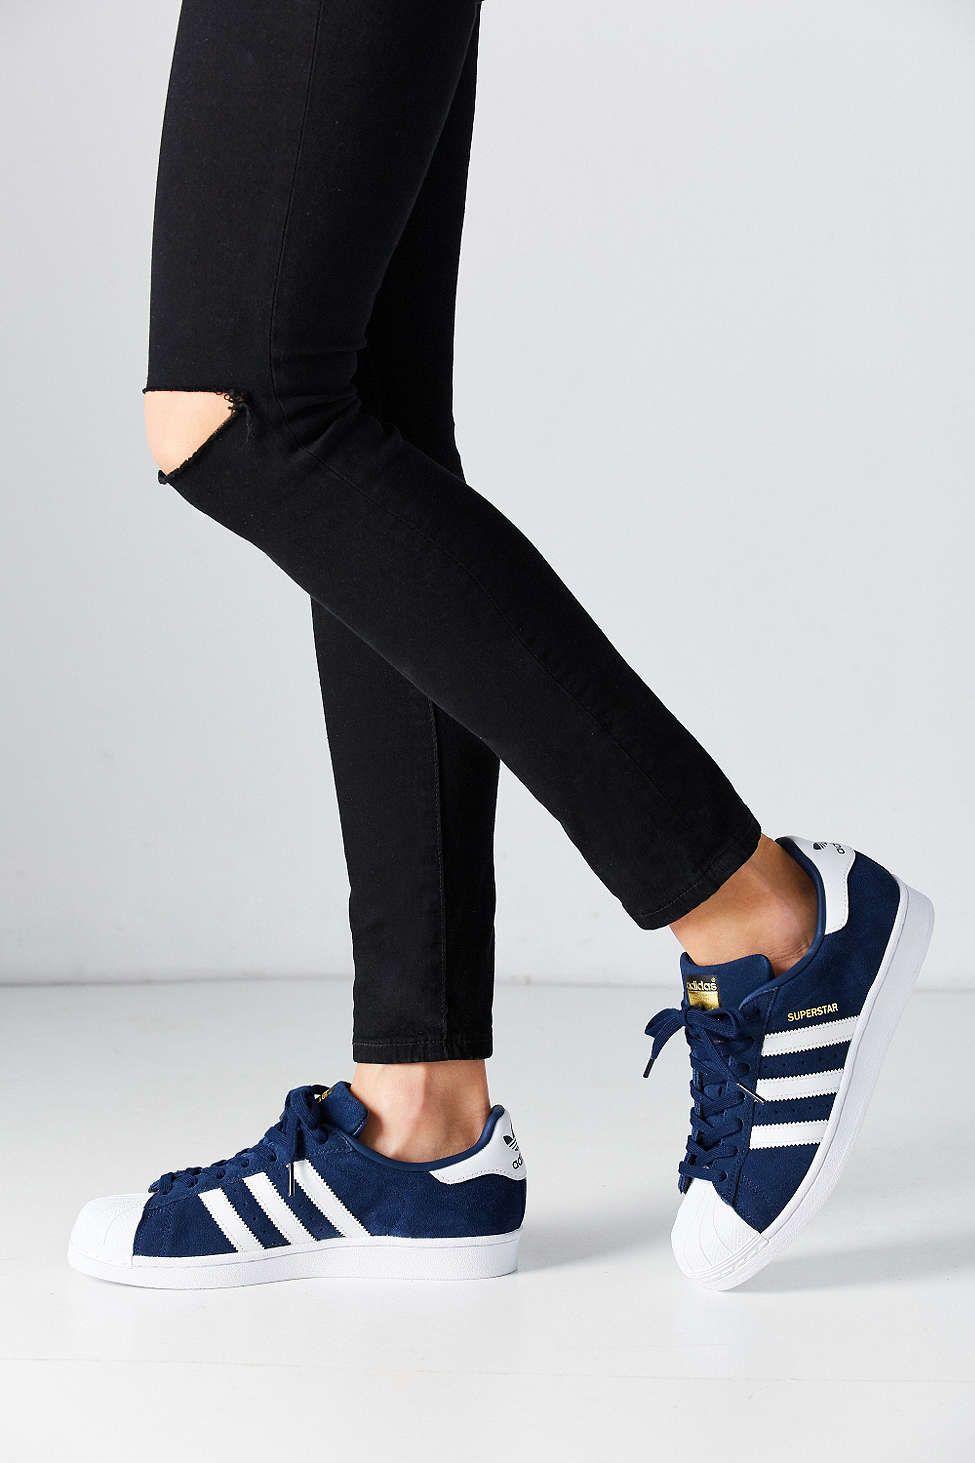 adidas superstar bleu marine femme